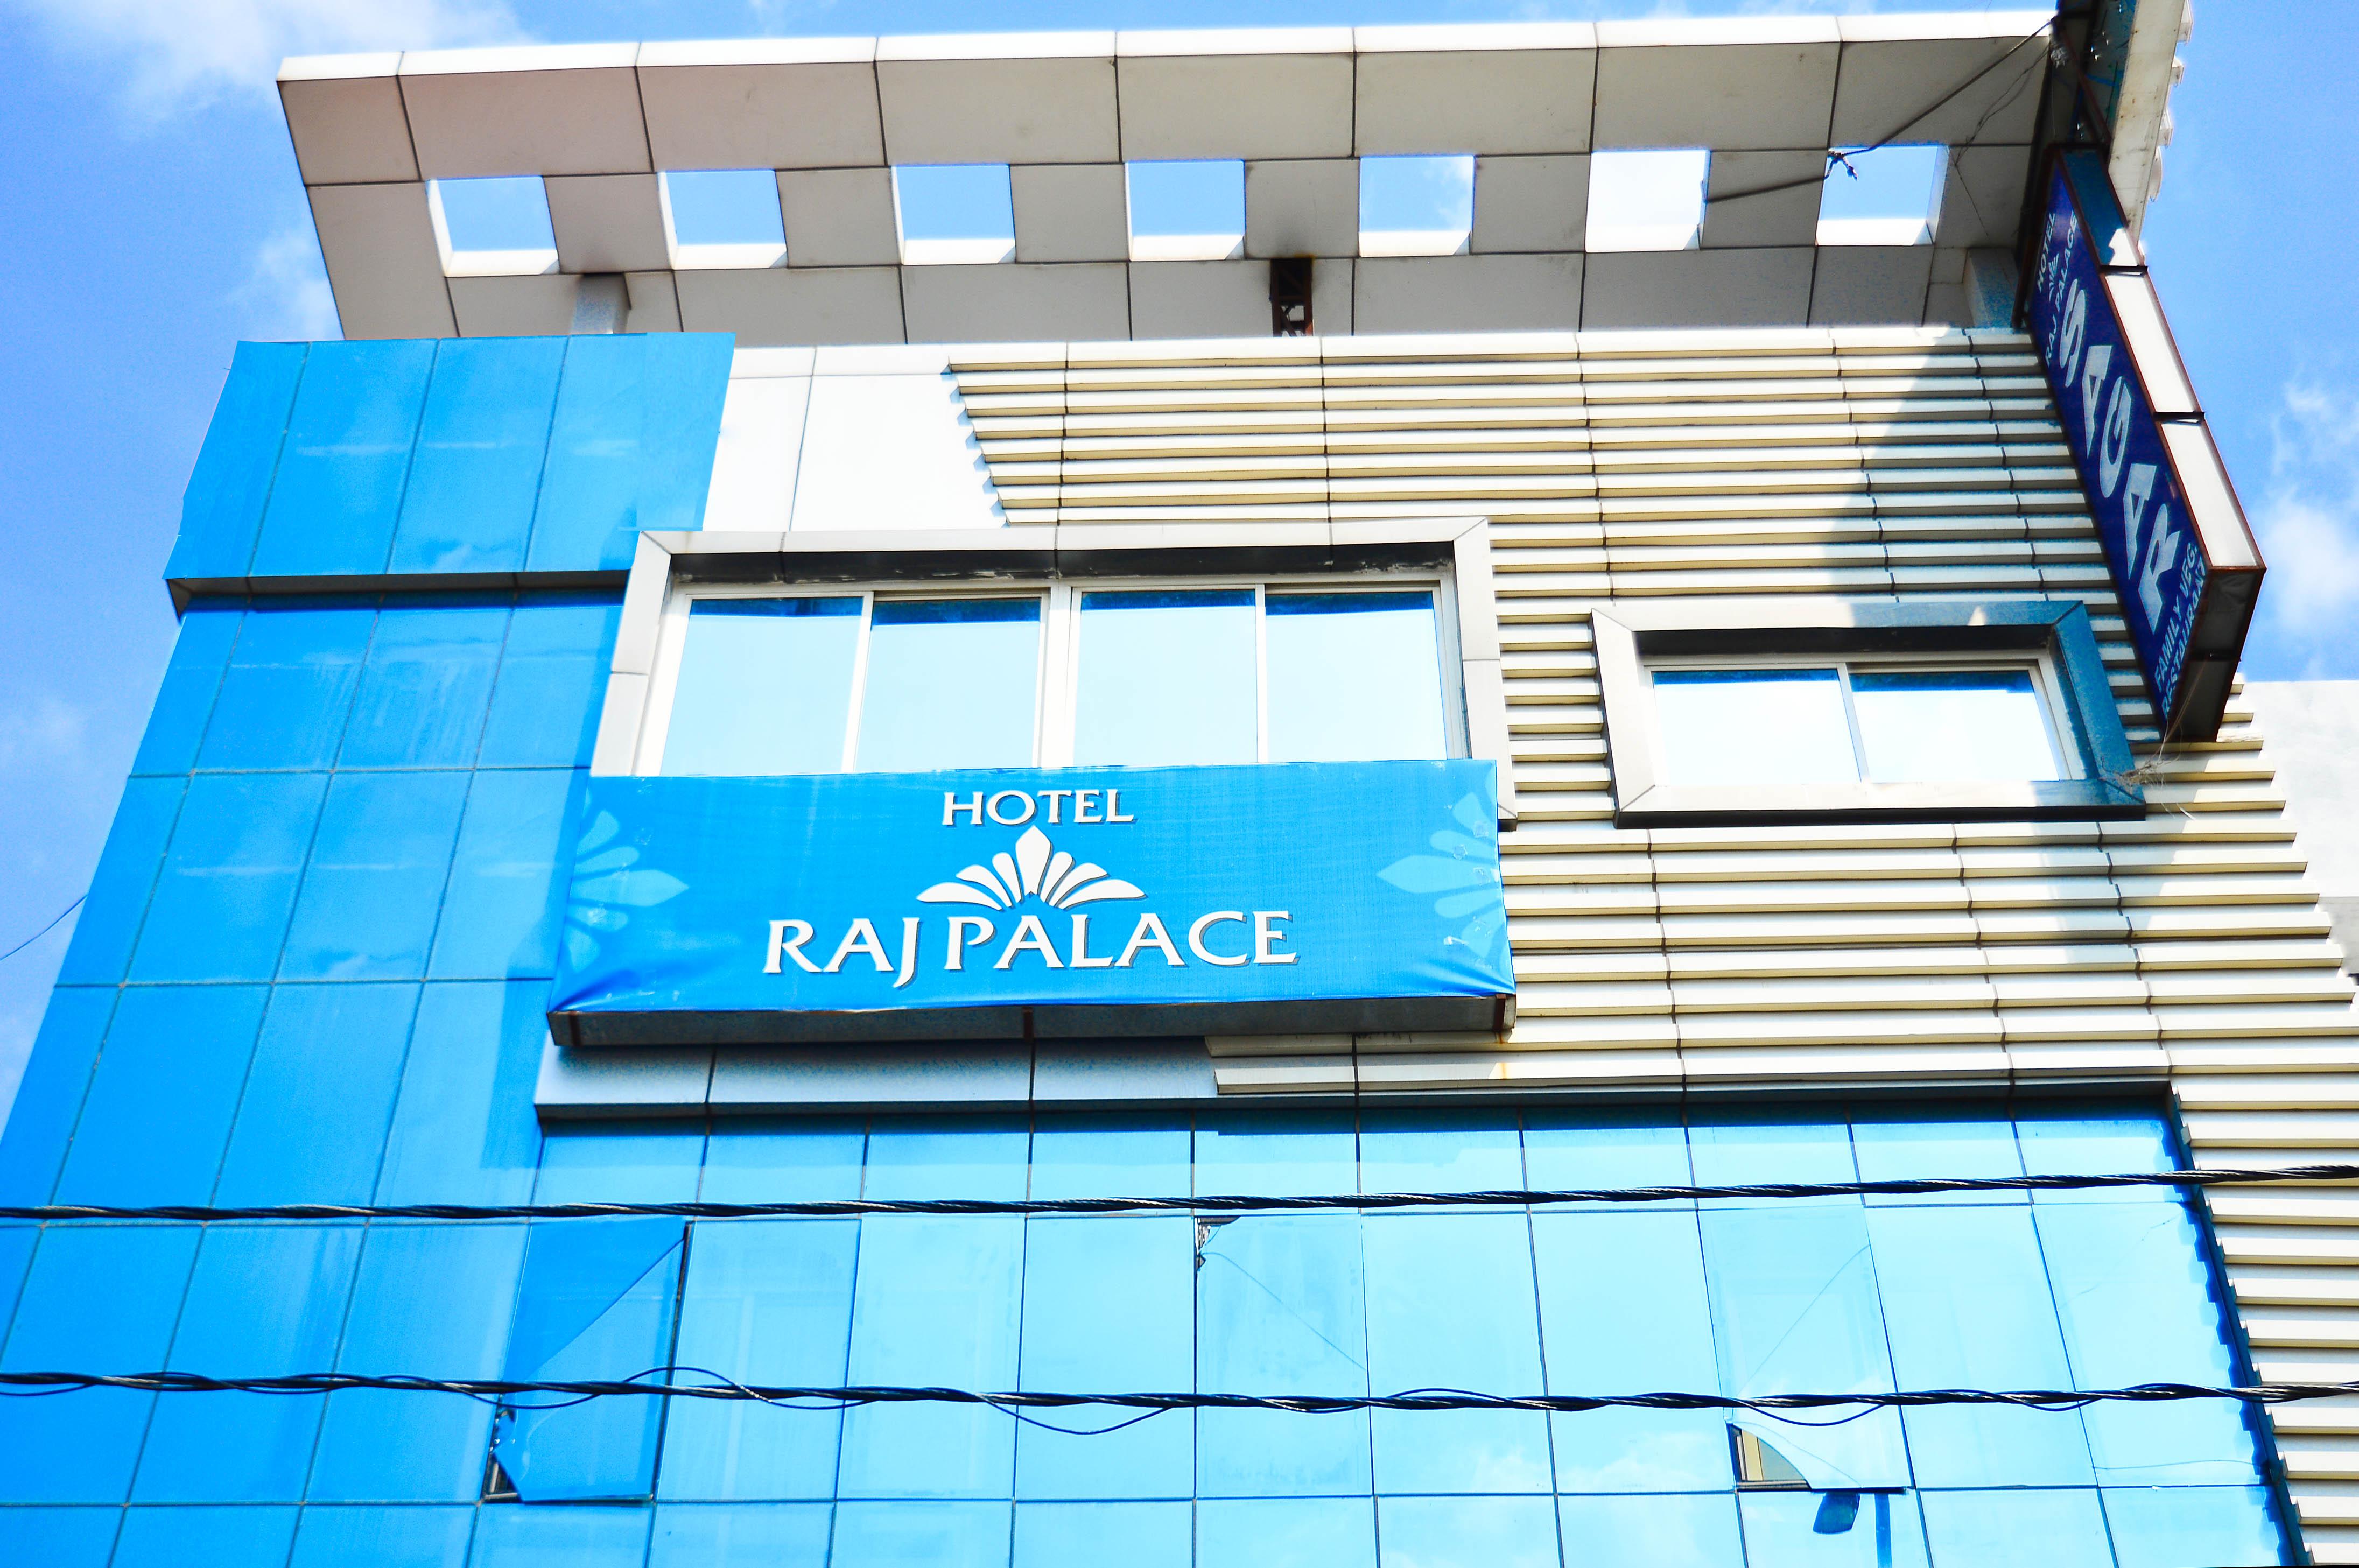 Hotel Raj Palace in ujjain